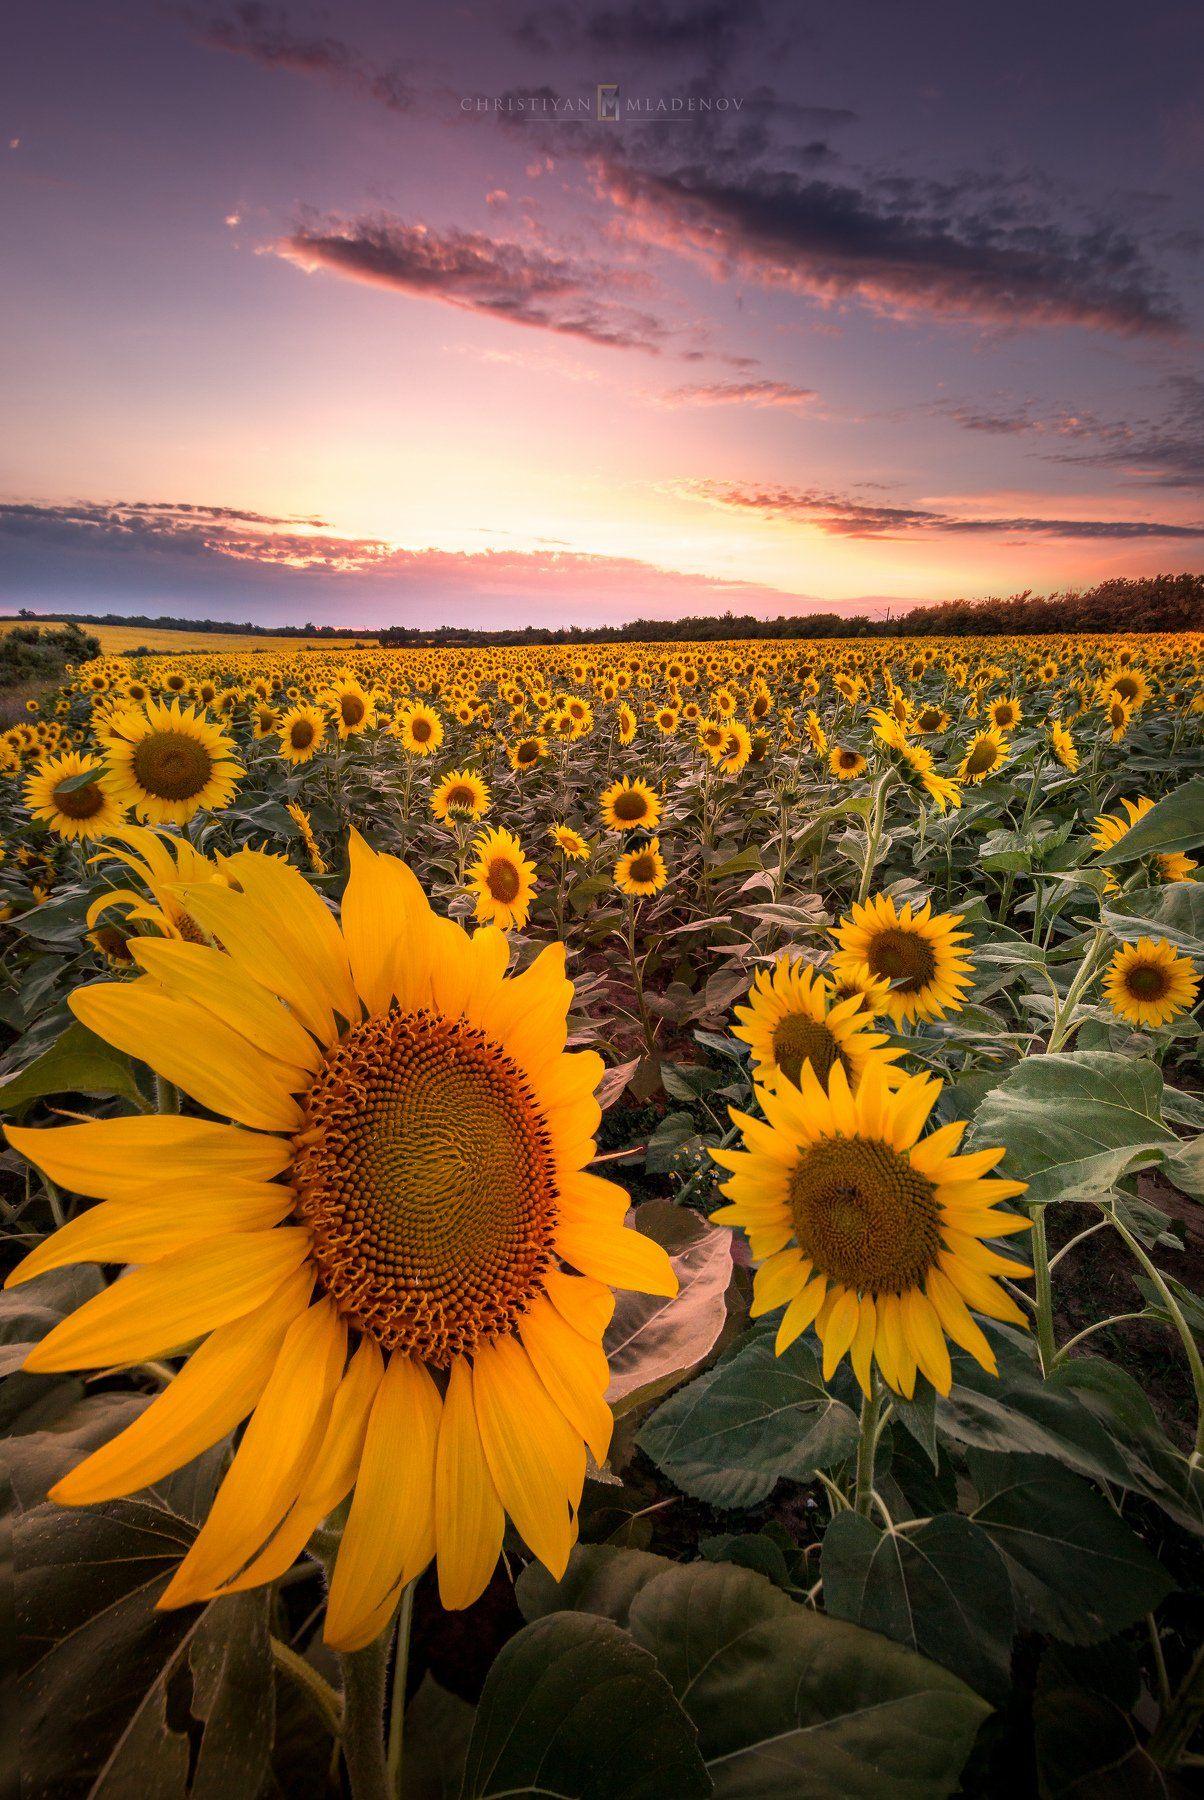 landscape, sunflowers, sunset, summer, nature, colors, sky, clouds, field, calm, light, magic hour, golden hour, Кристиян Младенов